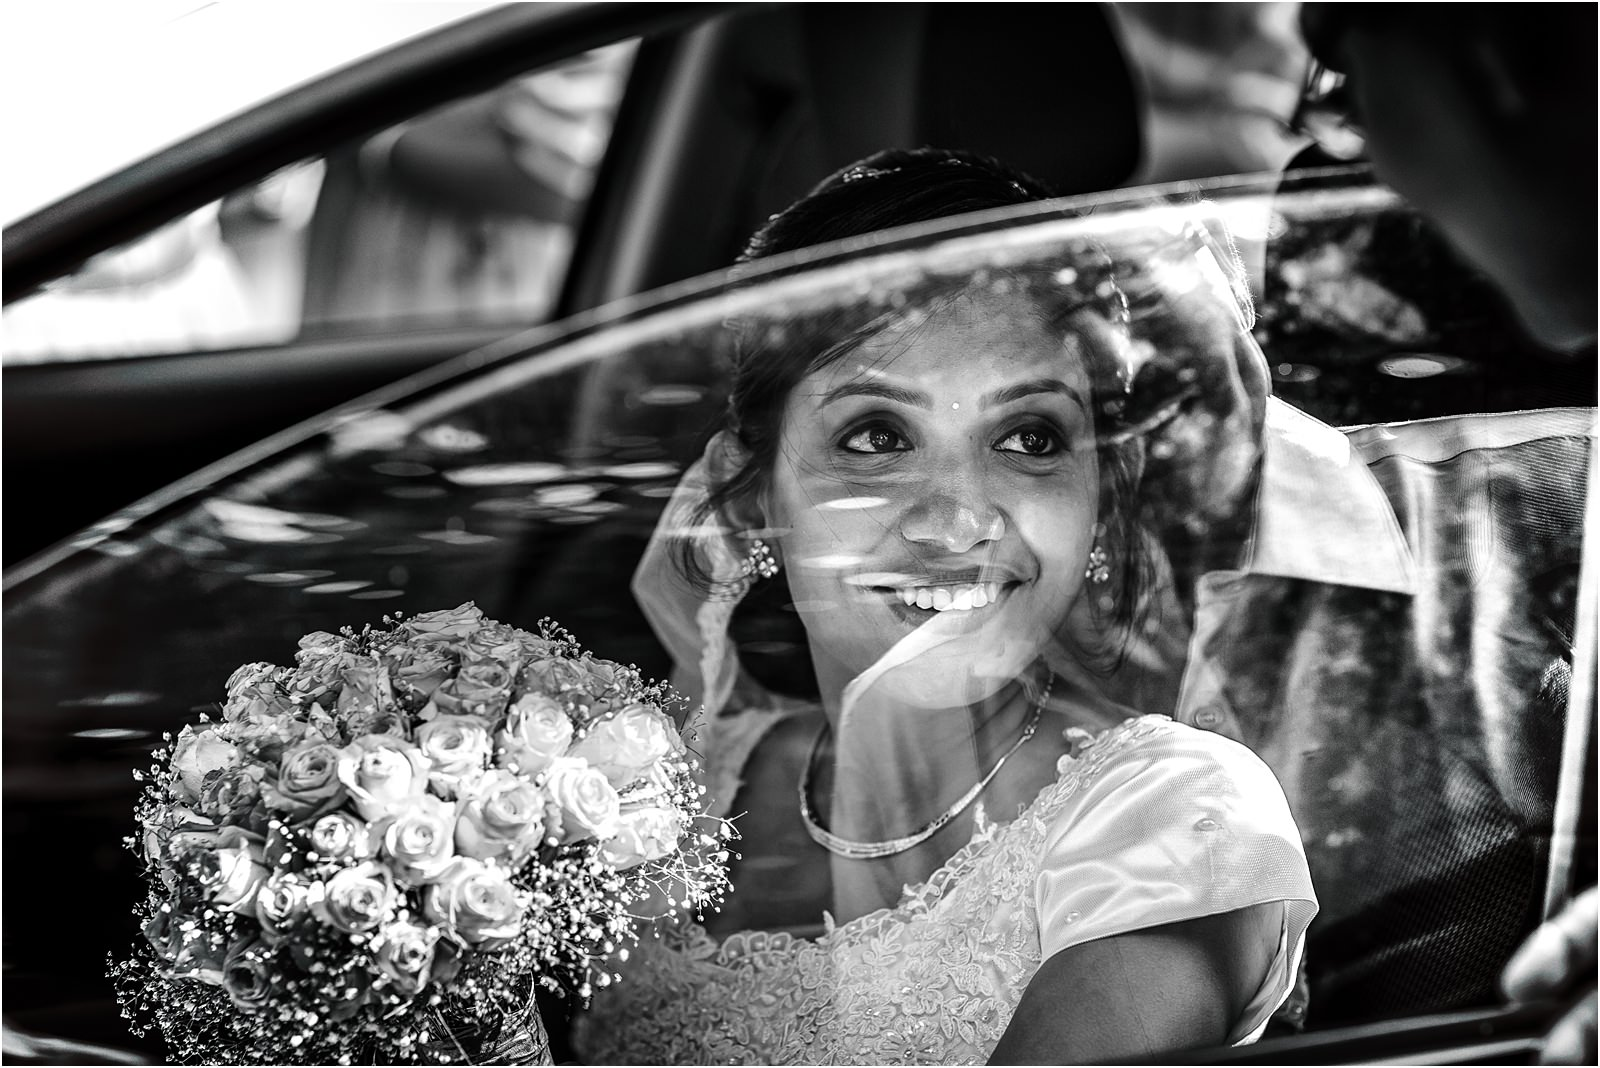 20151024-Anju-Dennis-Wedding-0320-Edit.jpg